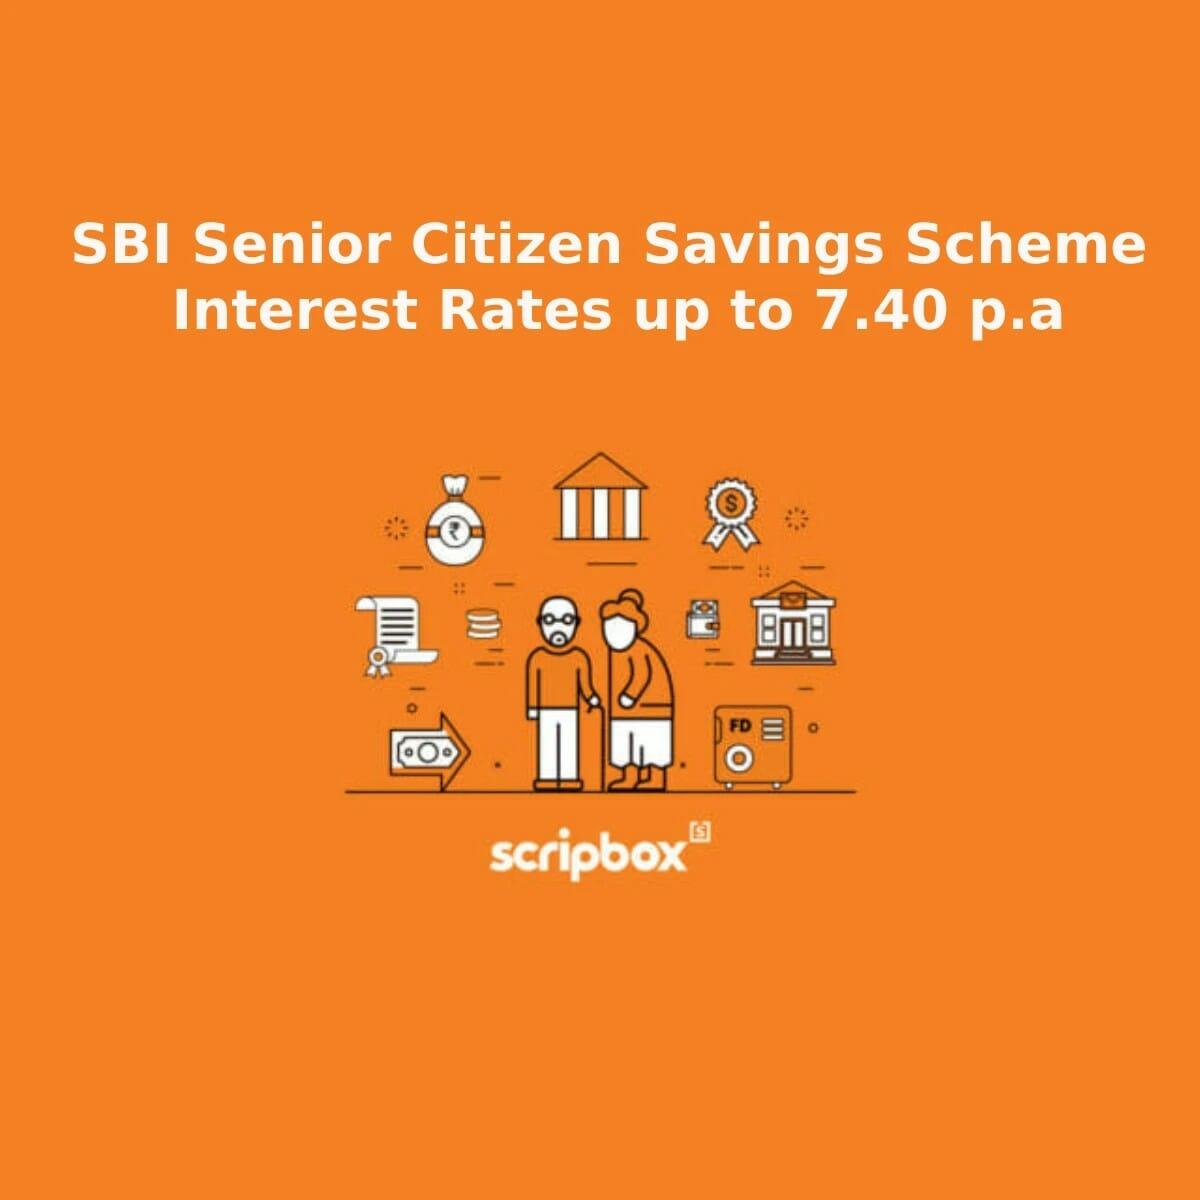 SBI Senior Citizen Savings Scheme Interest Rate